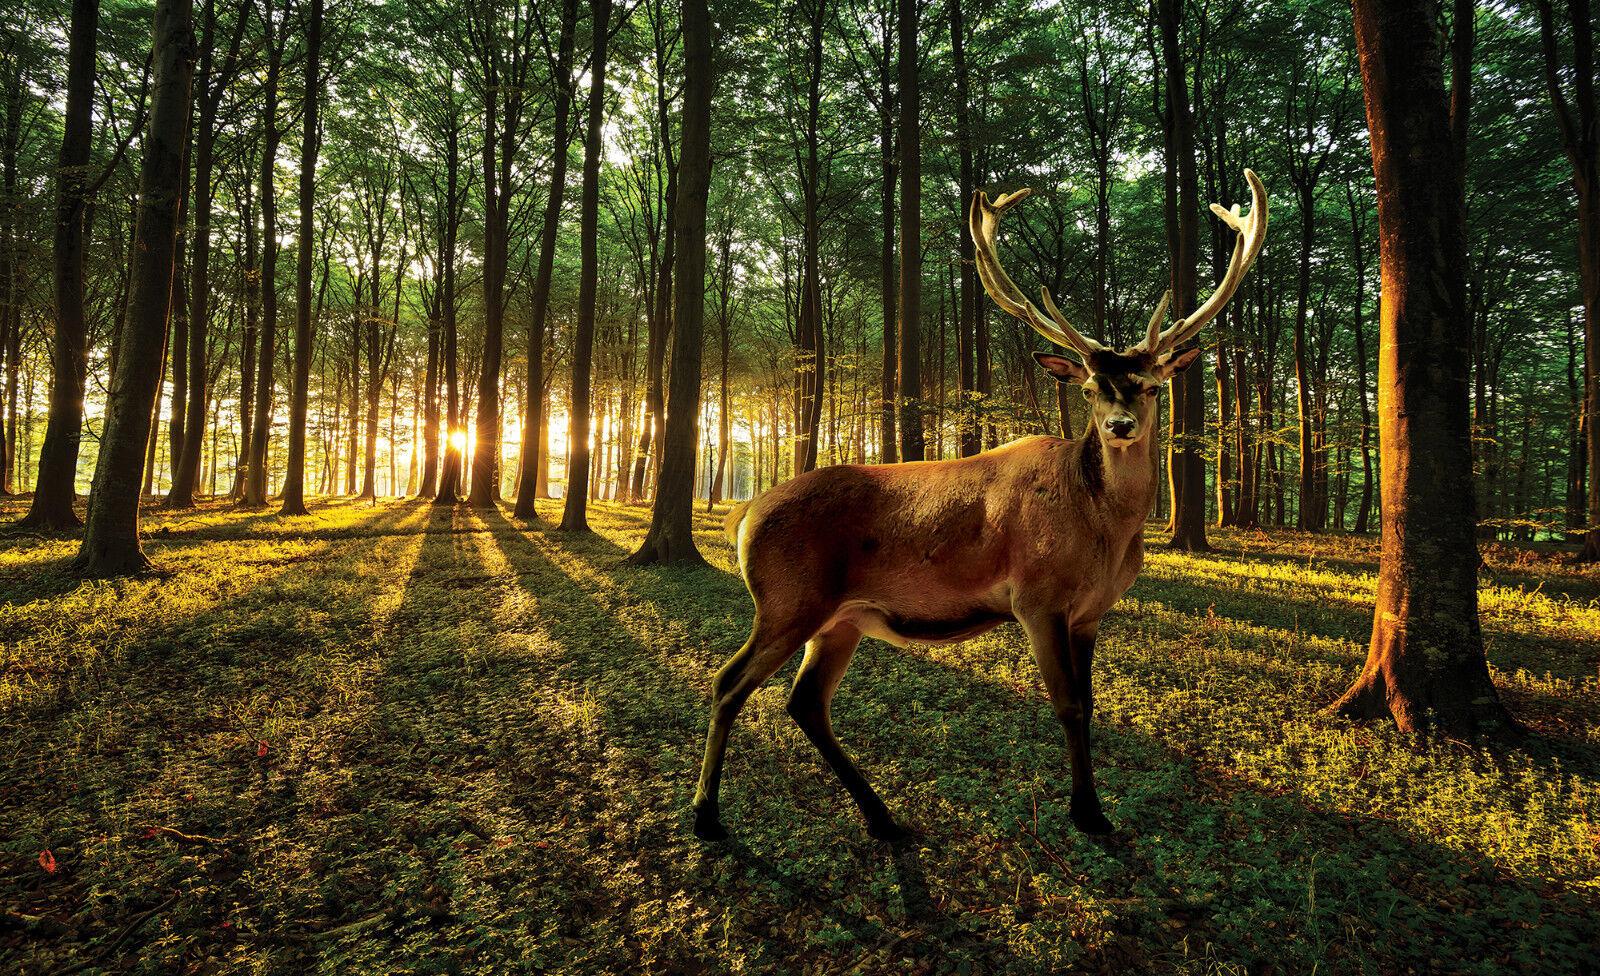 VLIES Fototapete-ROTHIRSCH-(3194)-Edel-Hirsch Rotwild Wald Bach Tier Jagd Wald